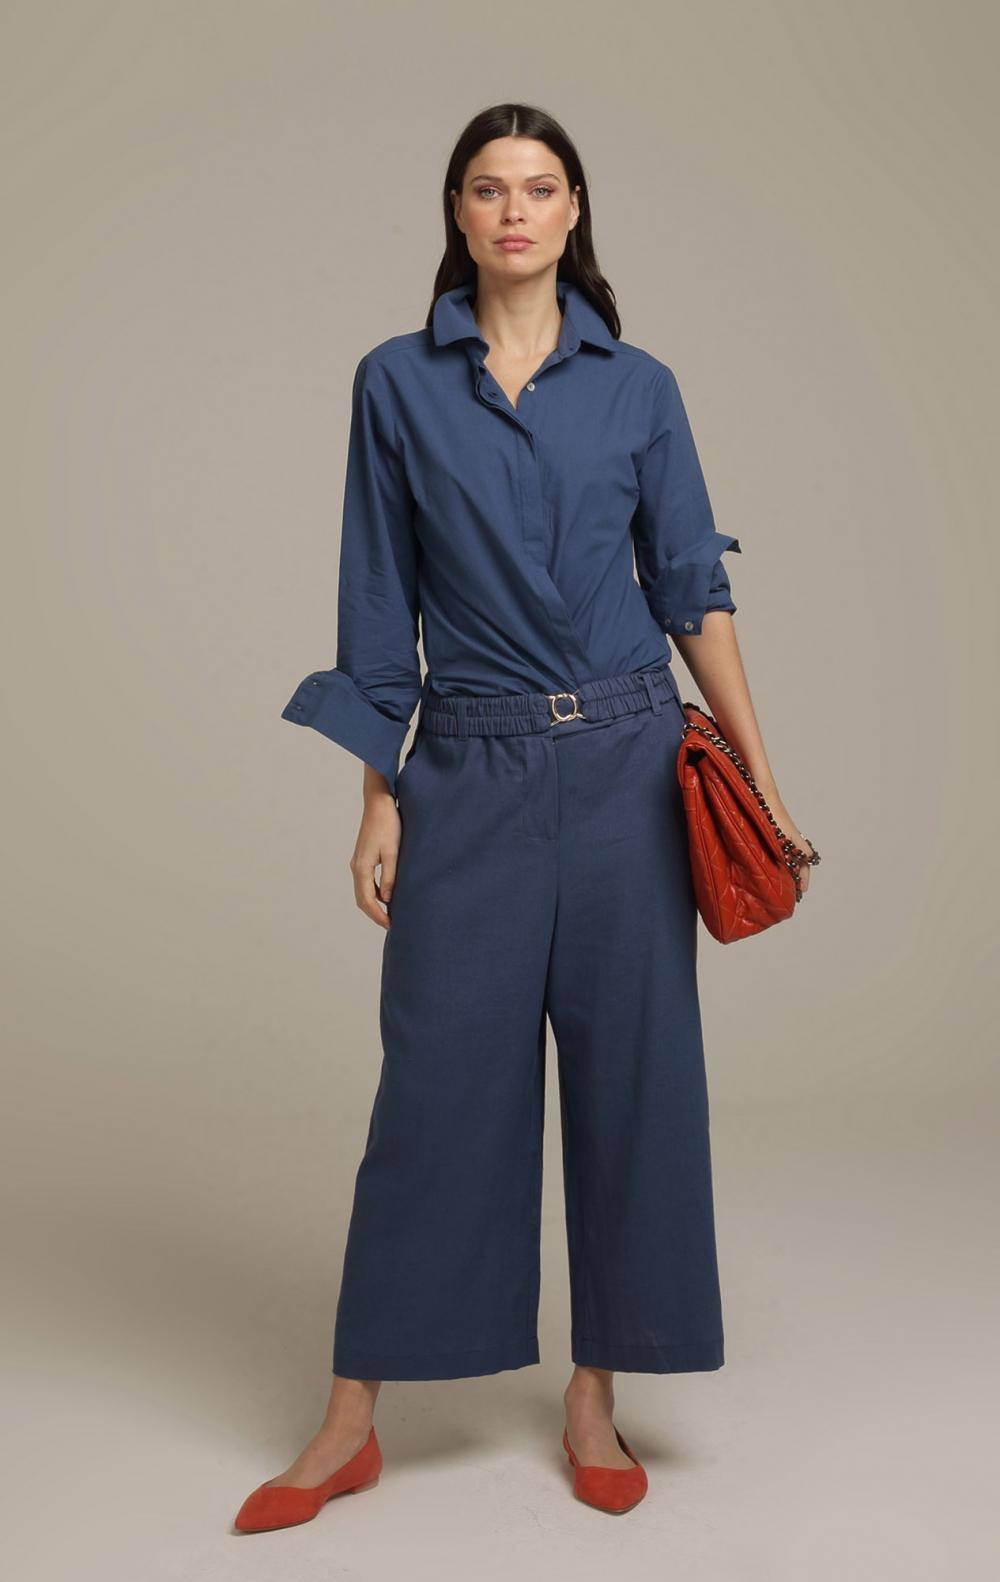 Calça AG Pantacourt Blue Jeans - Foto 1